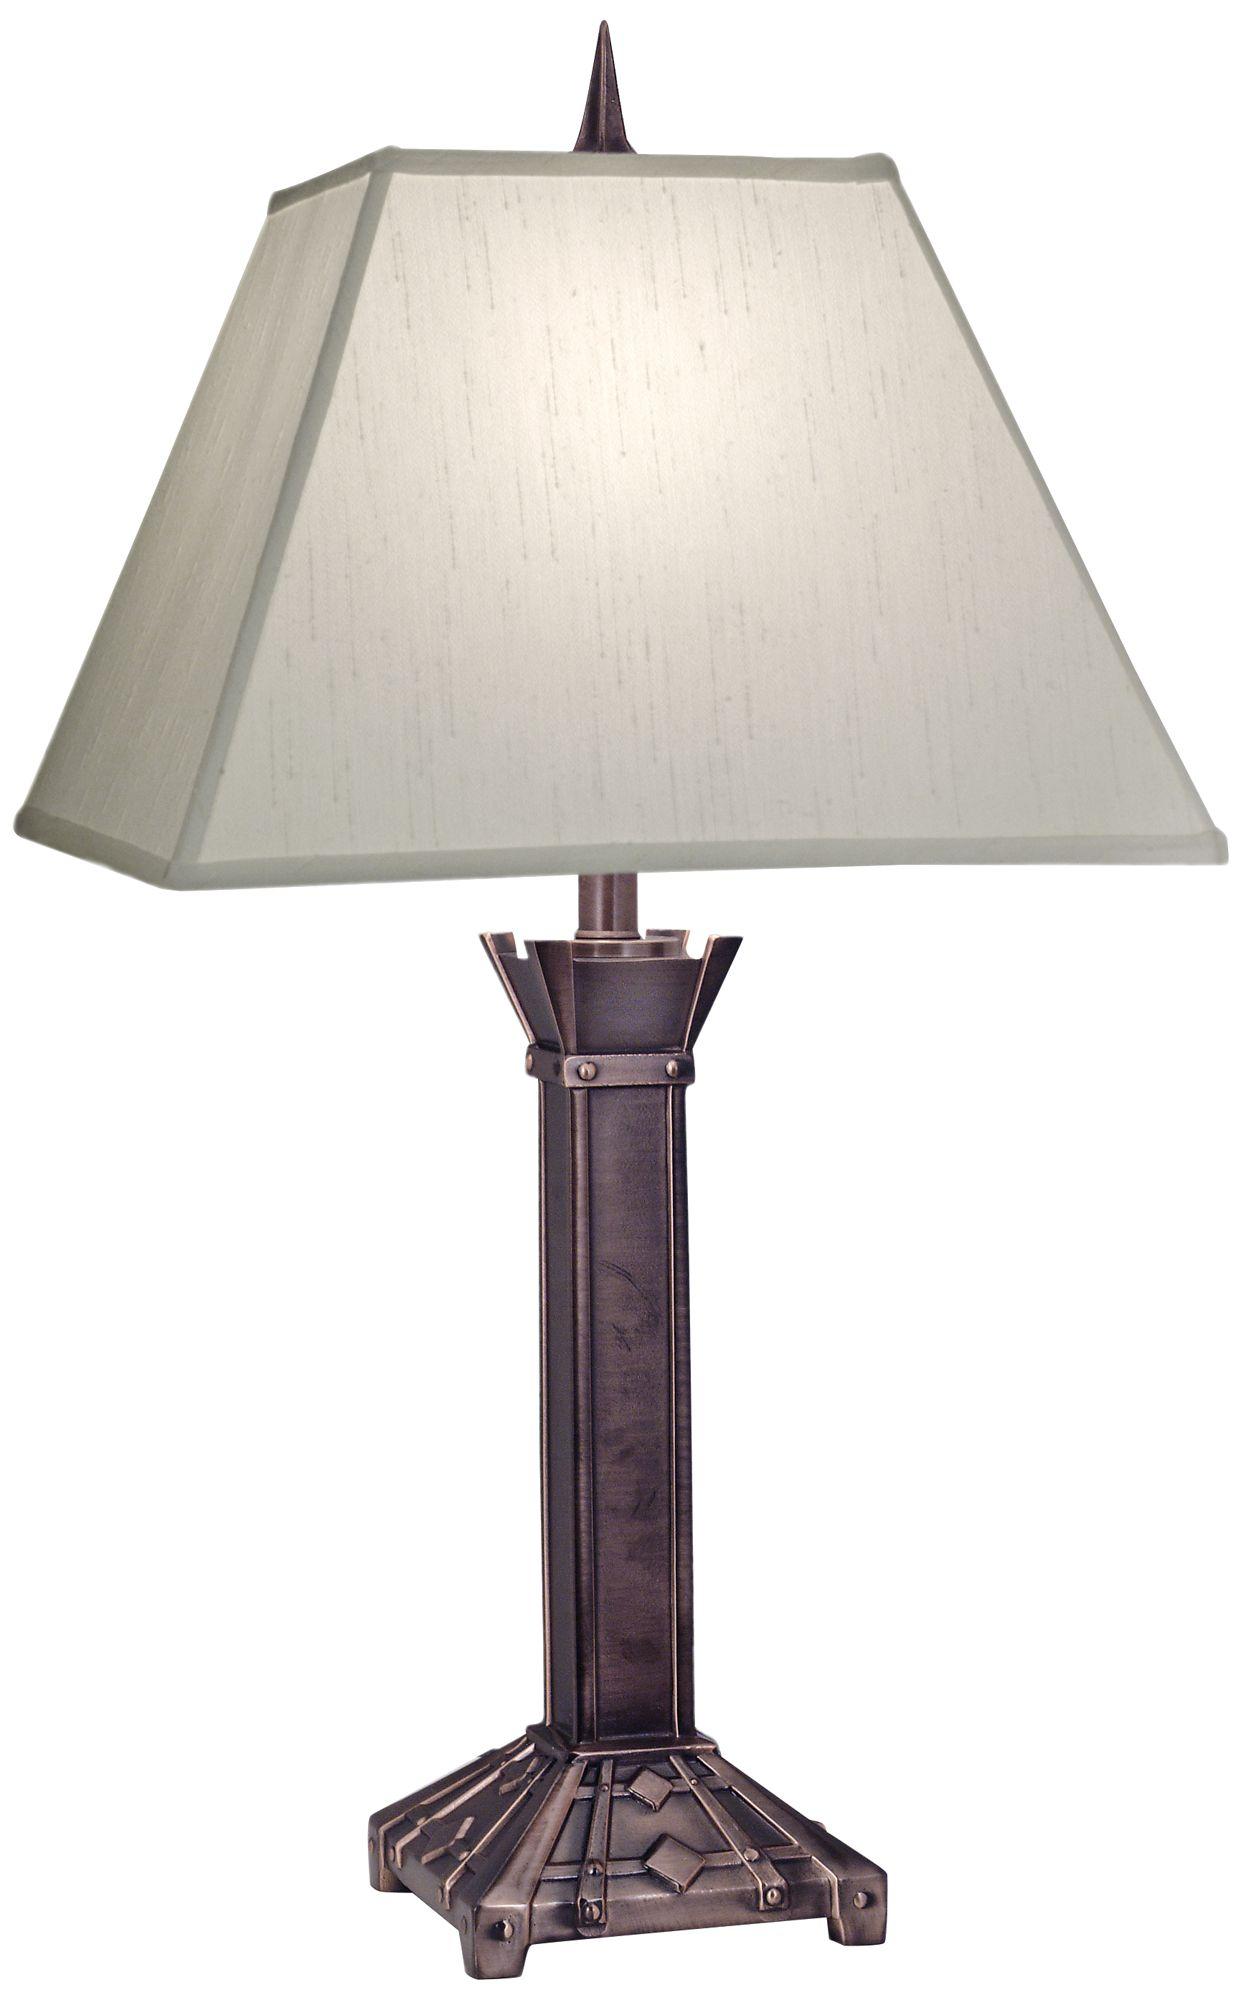 Stiffel Antique Copper Square Shade Table Lamp